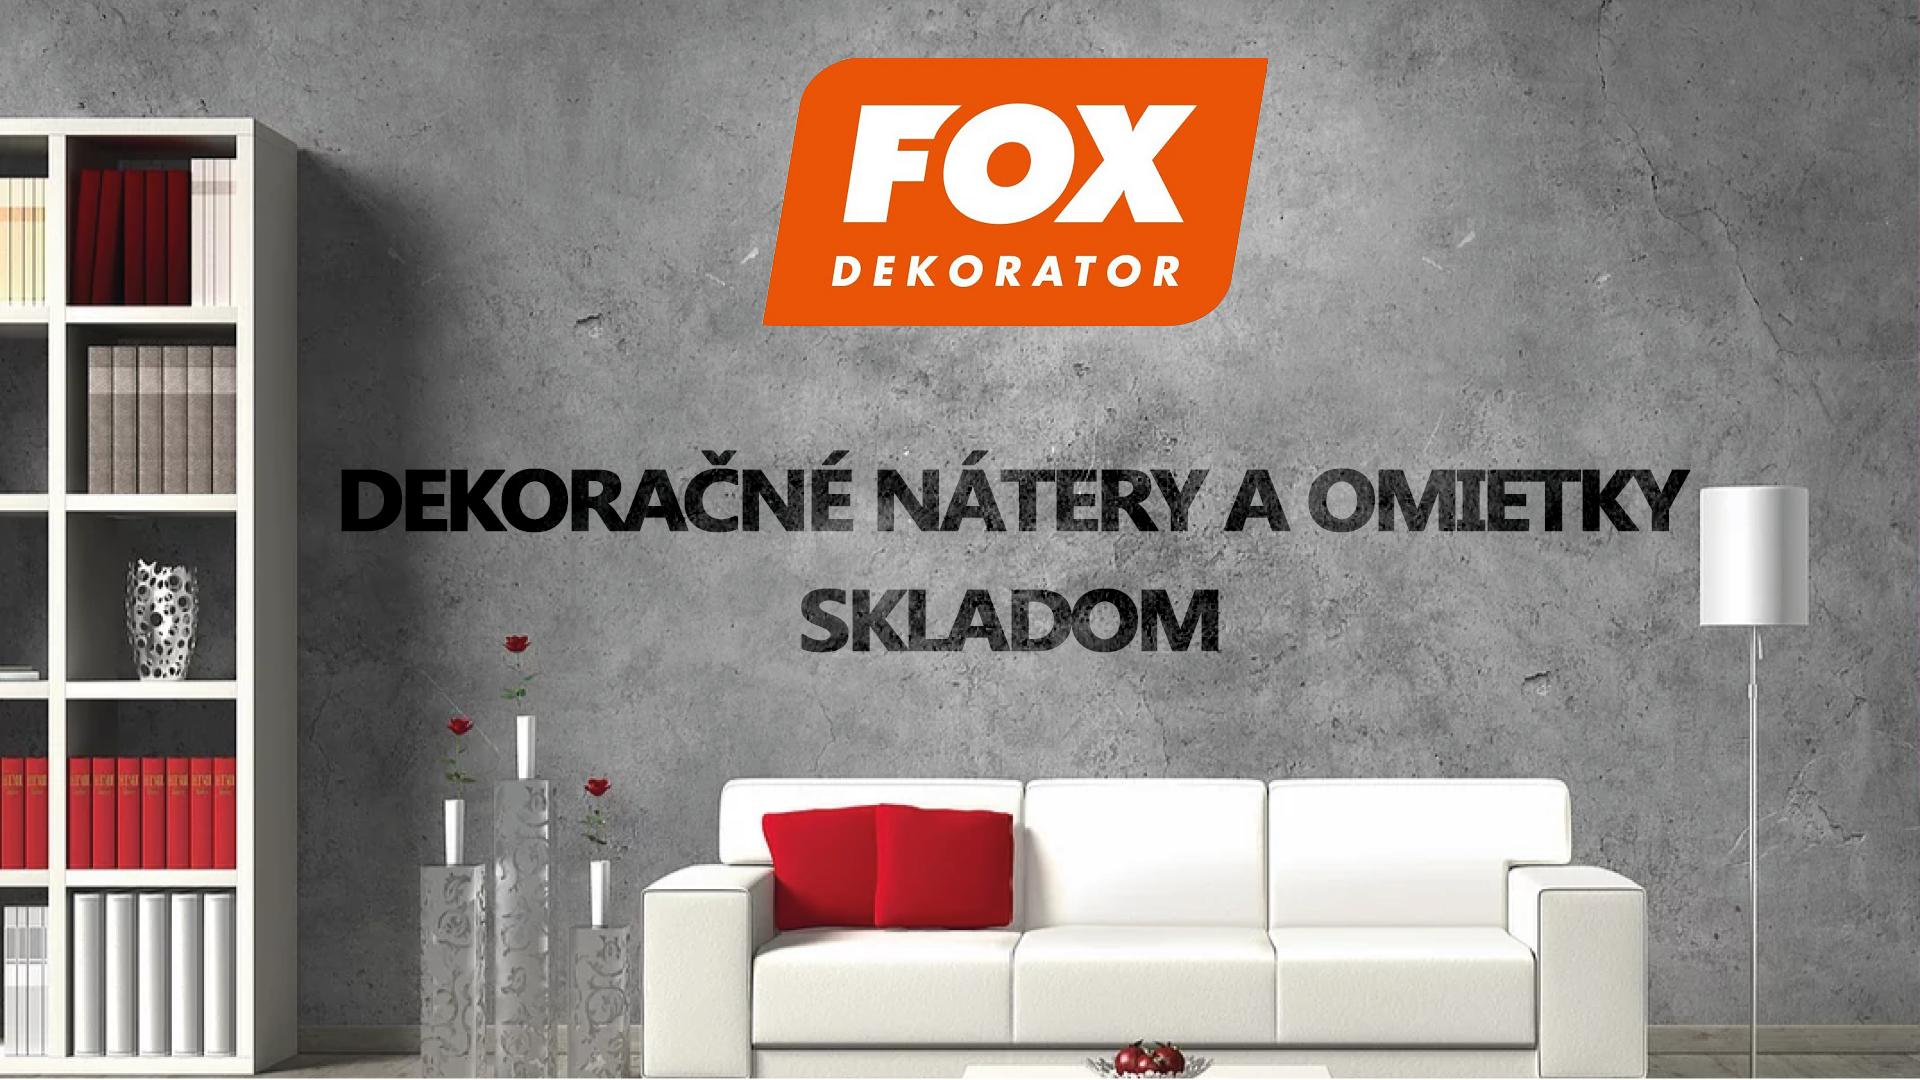 fox dekorator